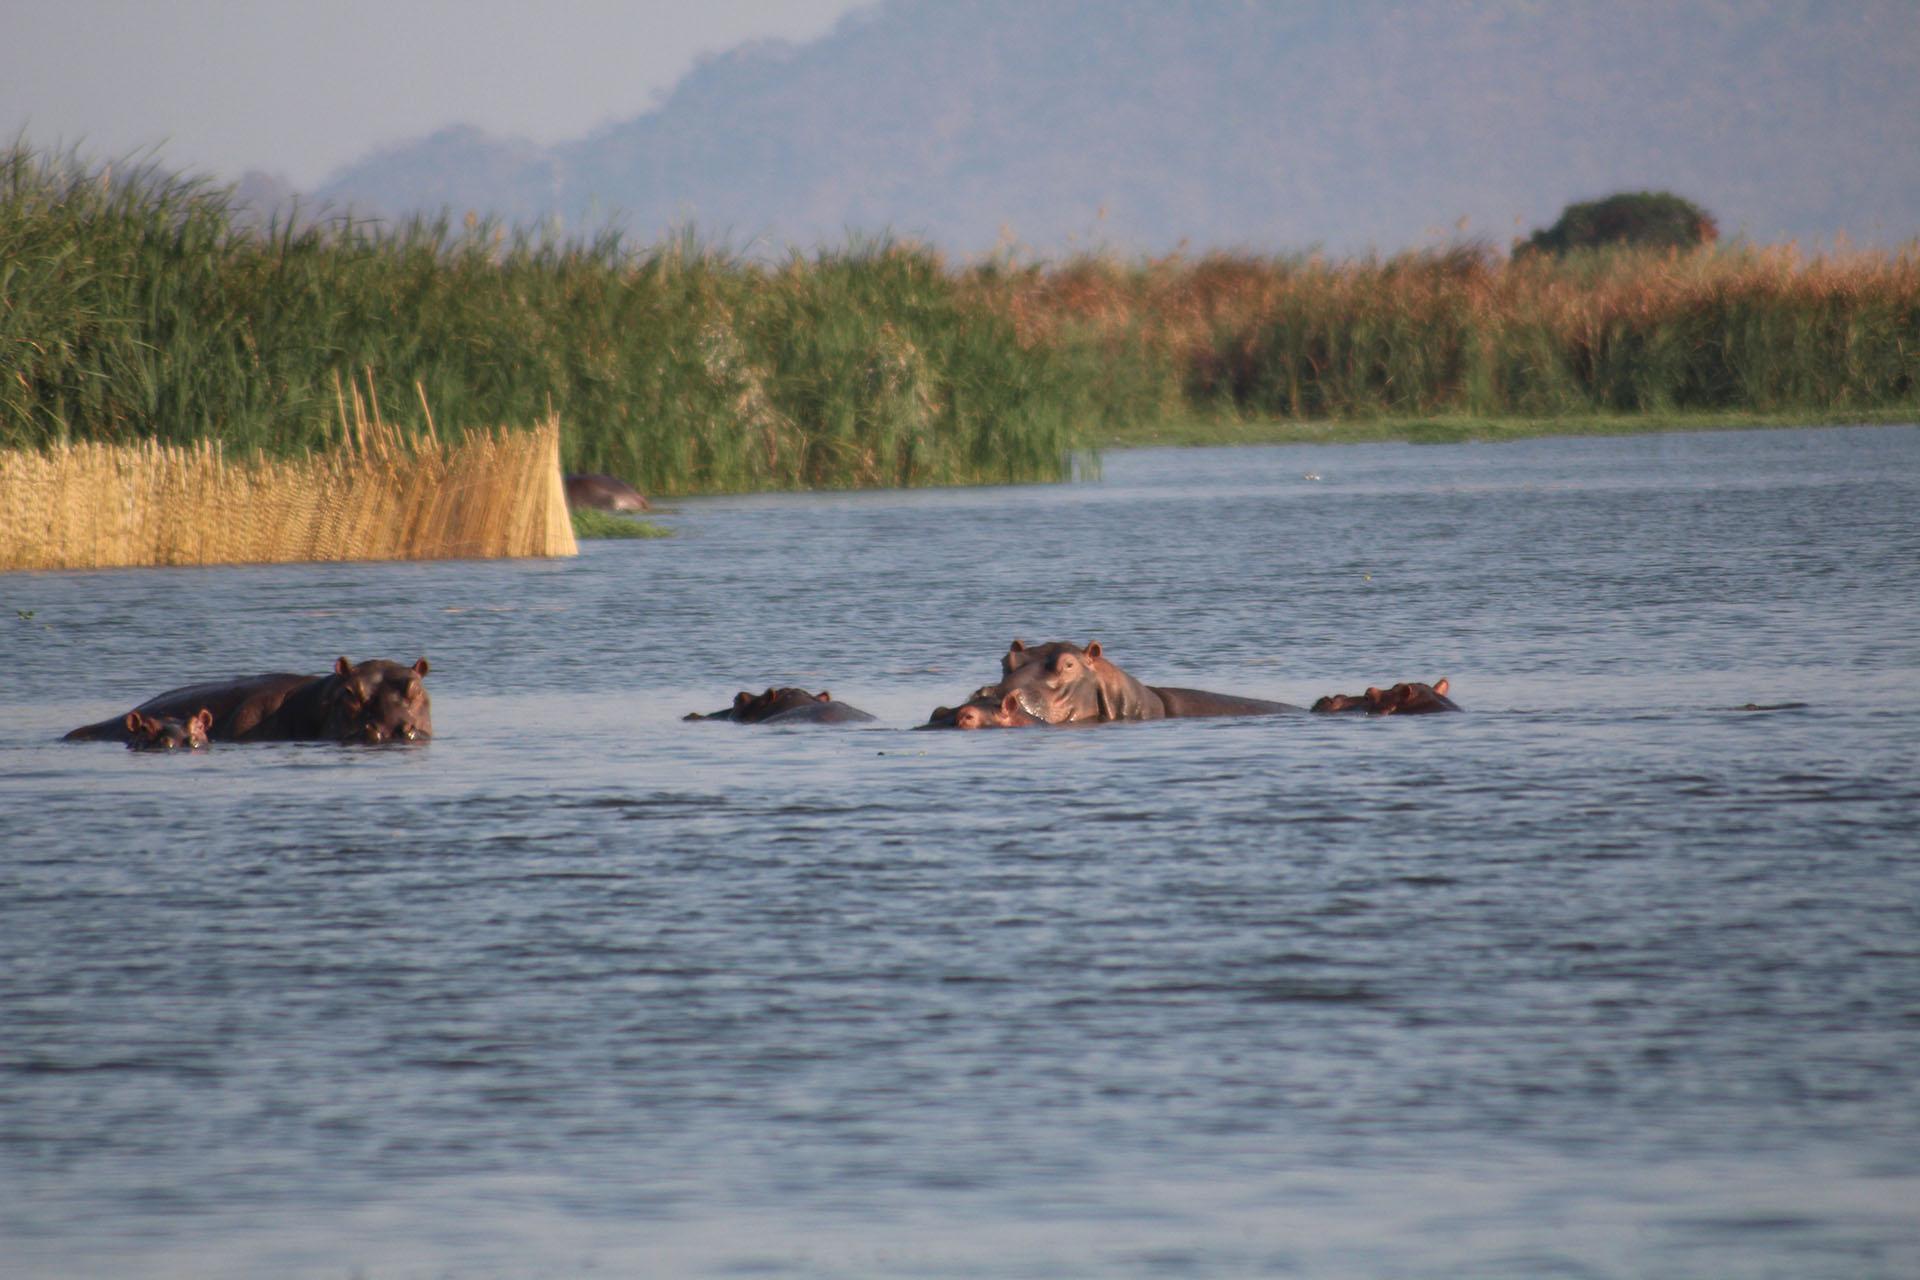 bush beach safaris off-season-safari-malawian-style-malawi-adventures-experiences-specialist-tour-operator-tours-kumbali-lake-retreat-hippos